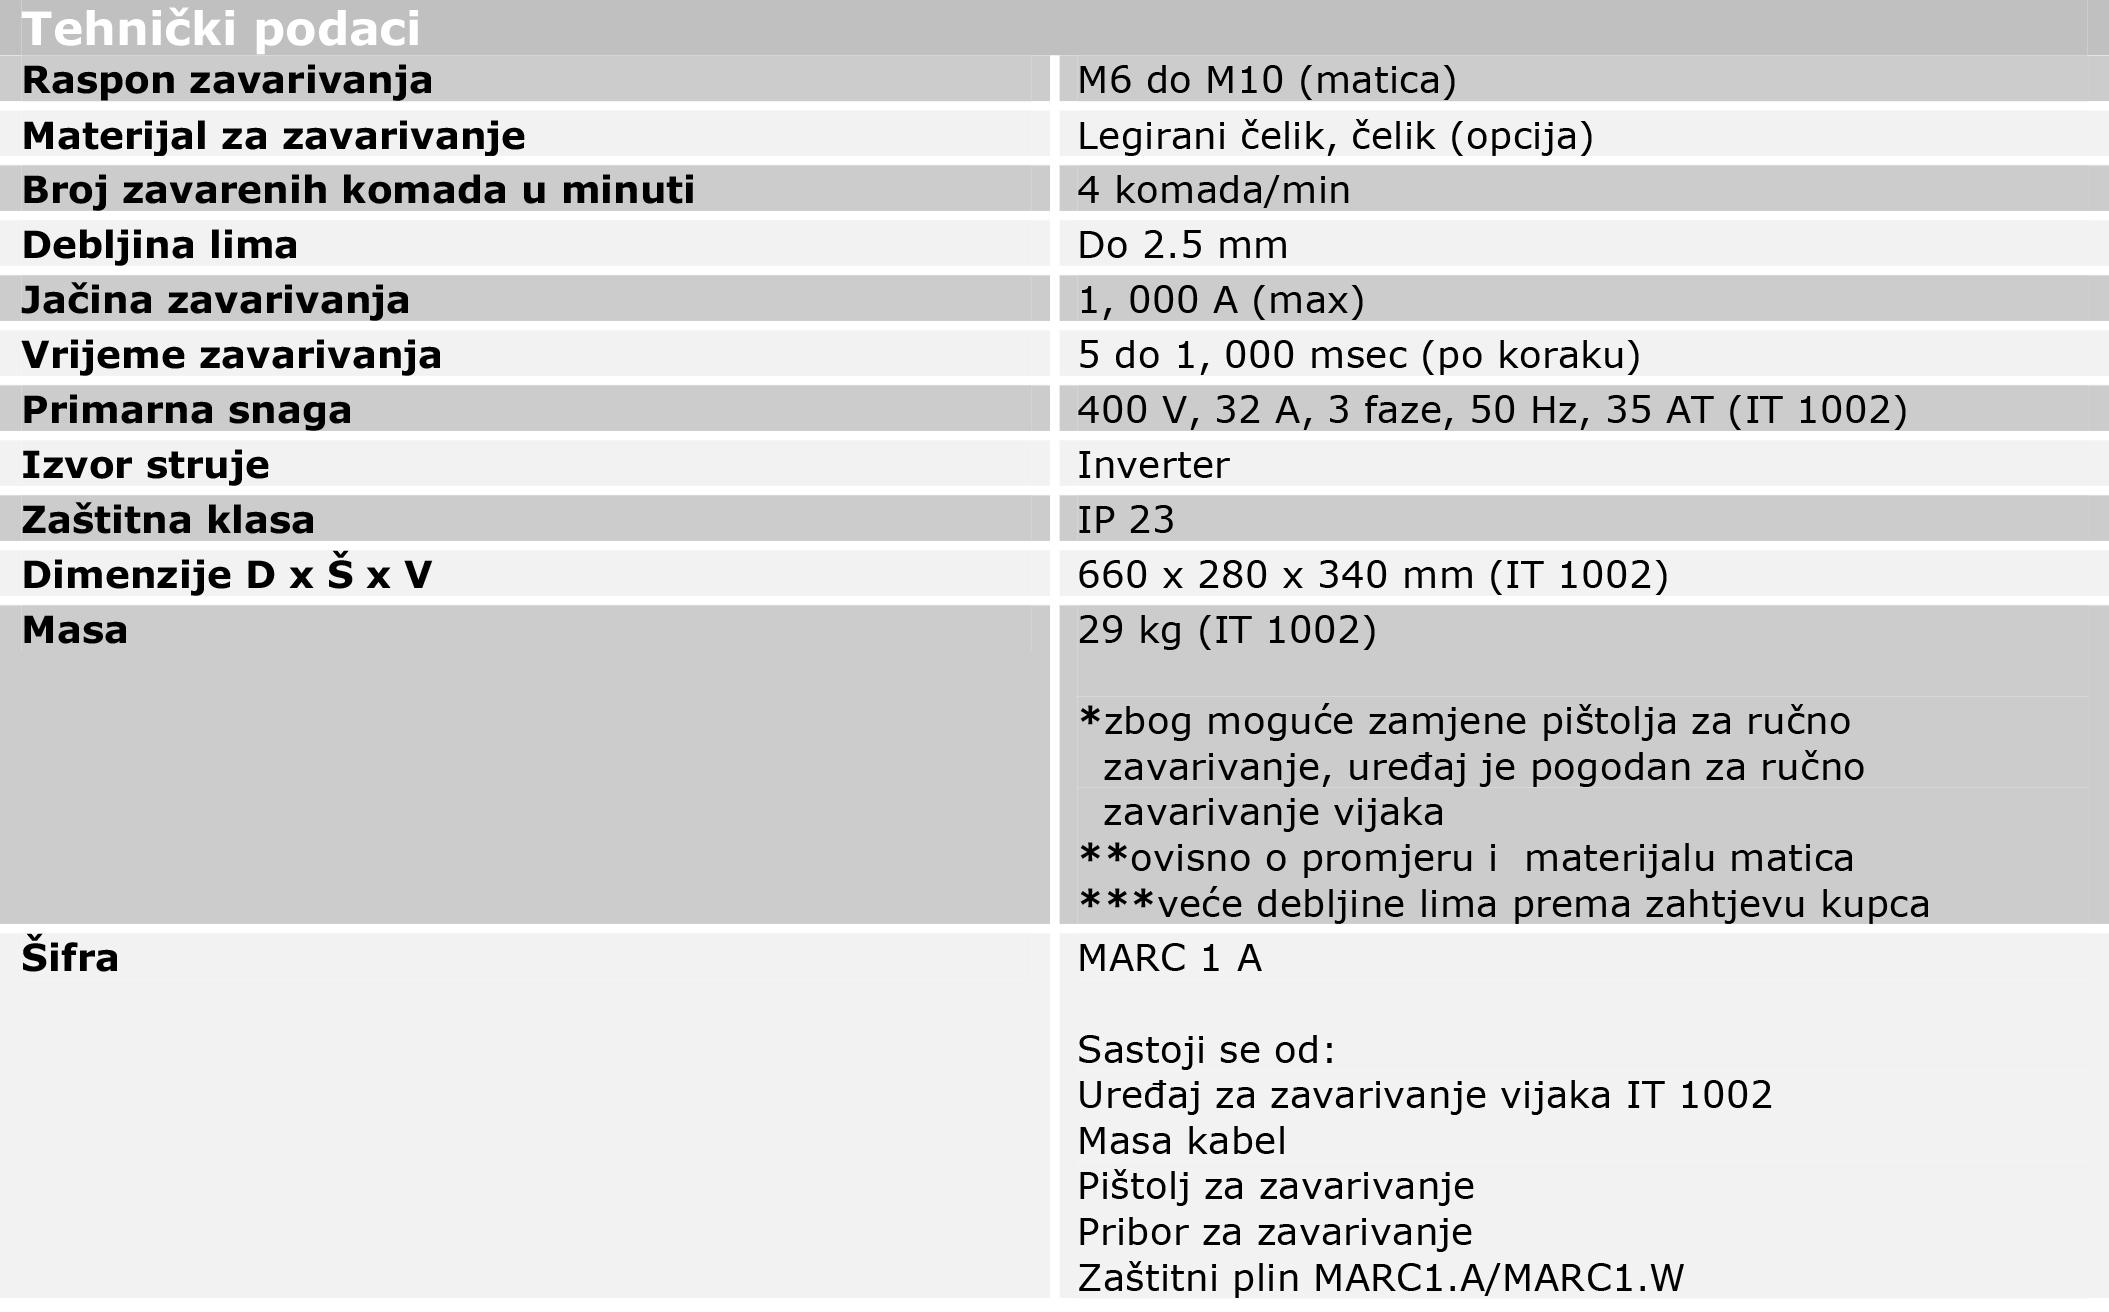 MARC 1 A-1